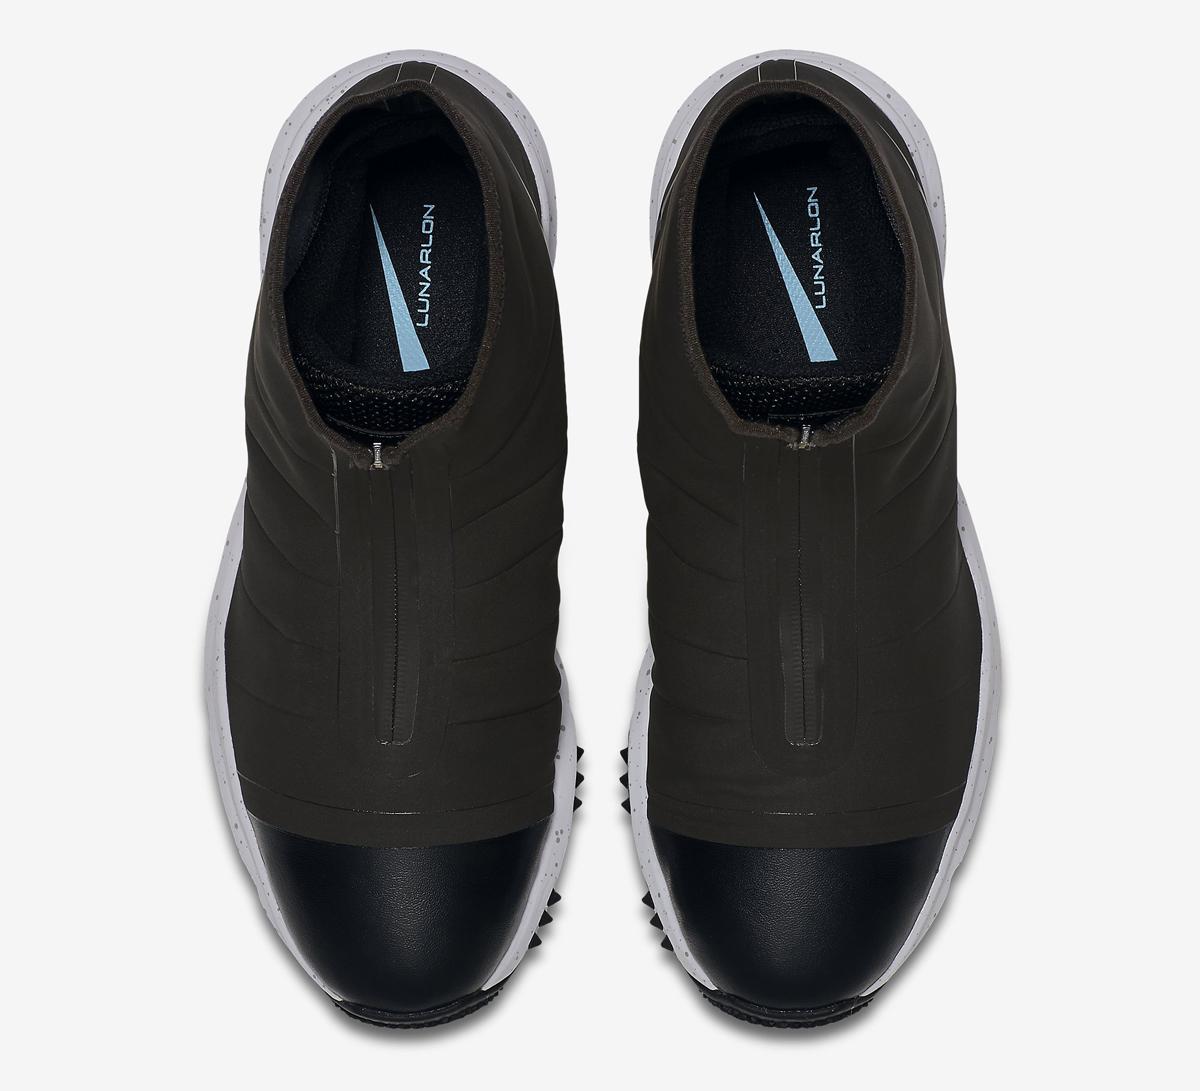 f124c6a351d8 Nike Lunar Bandon 3. Style    776108-001. Price   190